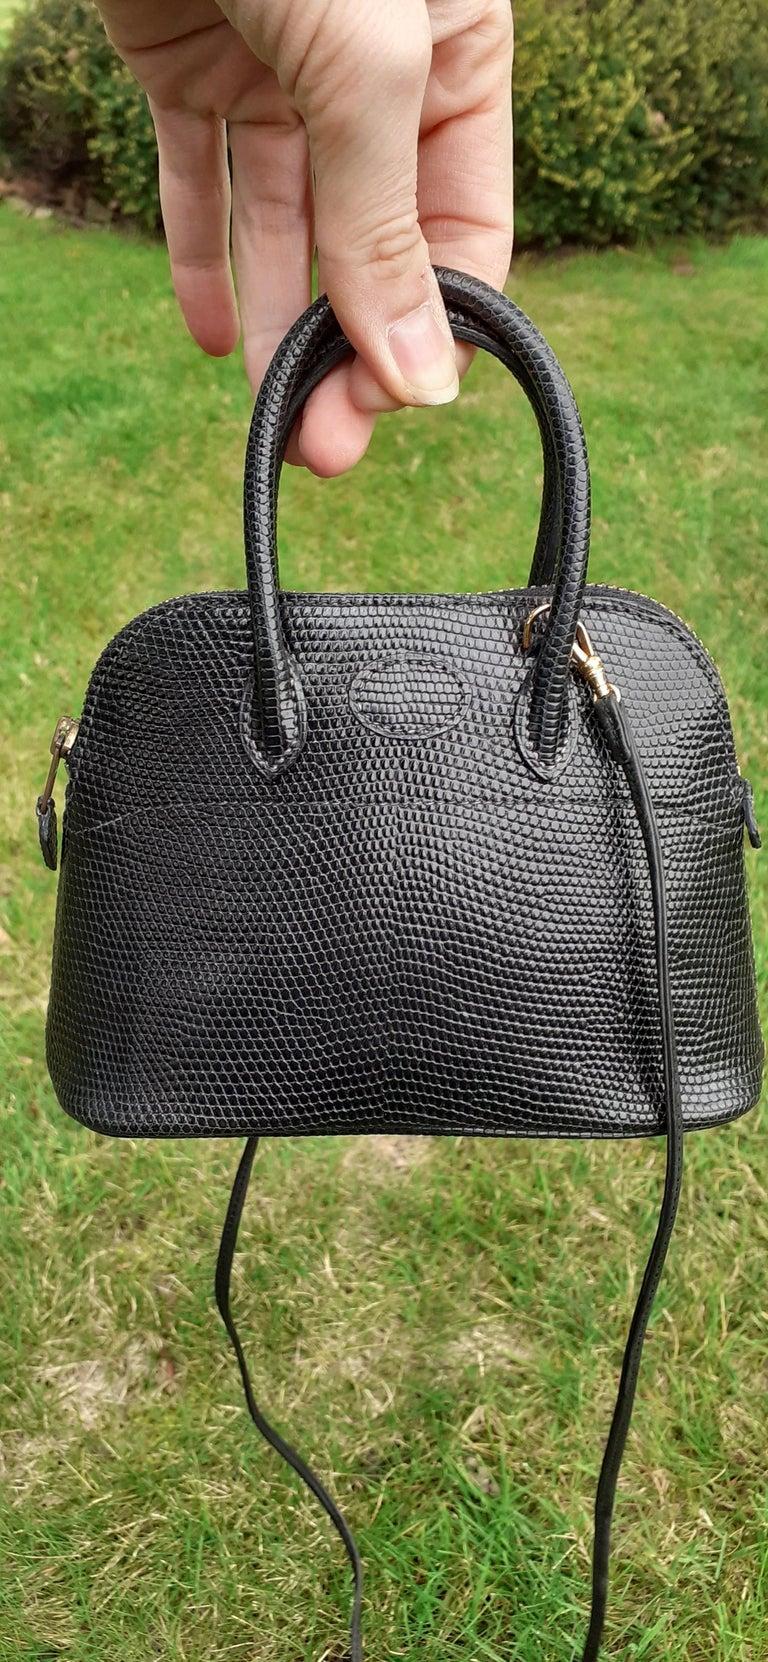 Exceptional Hermès Micro Bolide Bag Black Lizard Golden Hdw 16 cm RARE For Sale 11